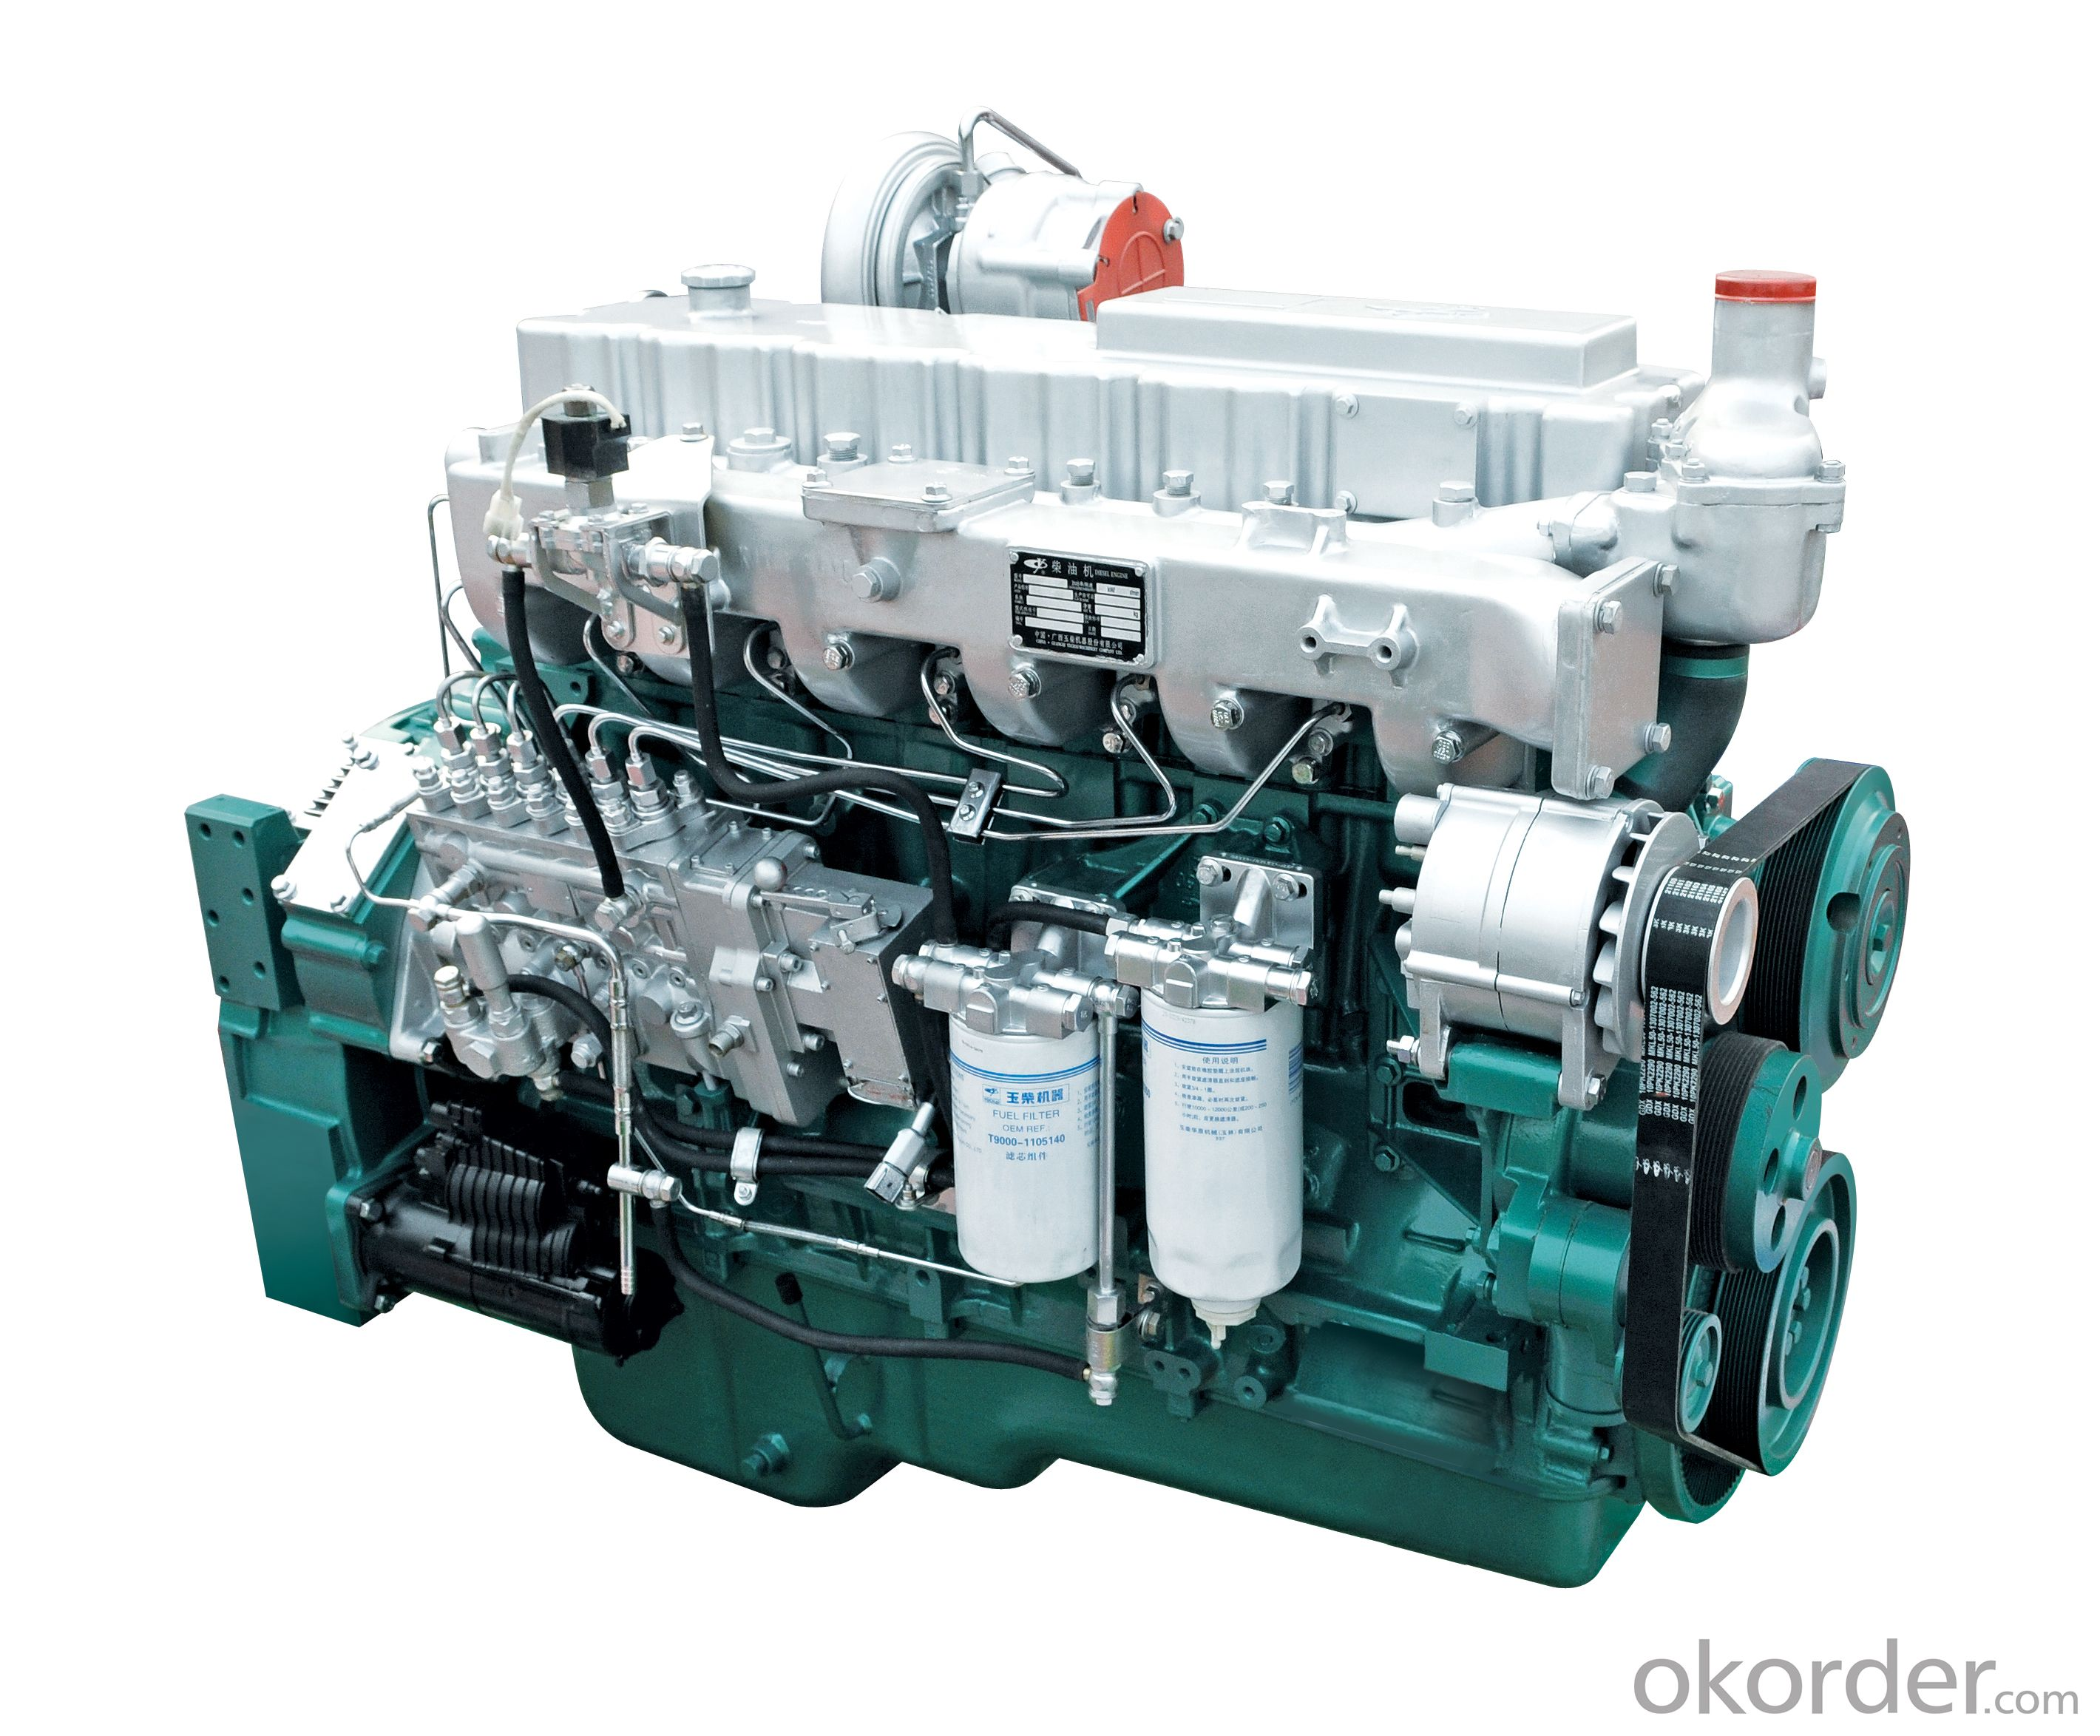 Yuchai  YC6M (160-250kW) Series Engines for Generators